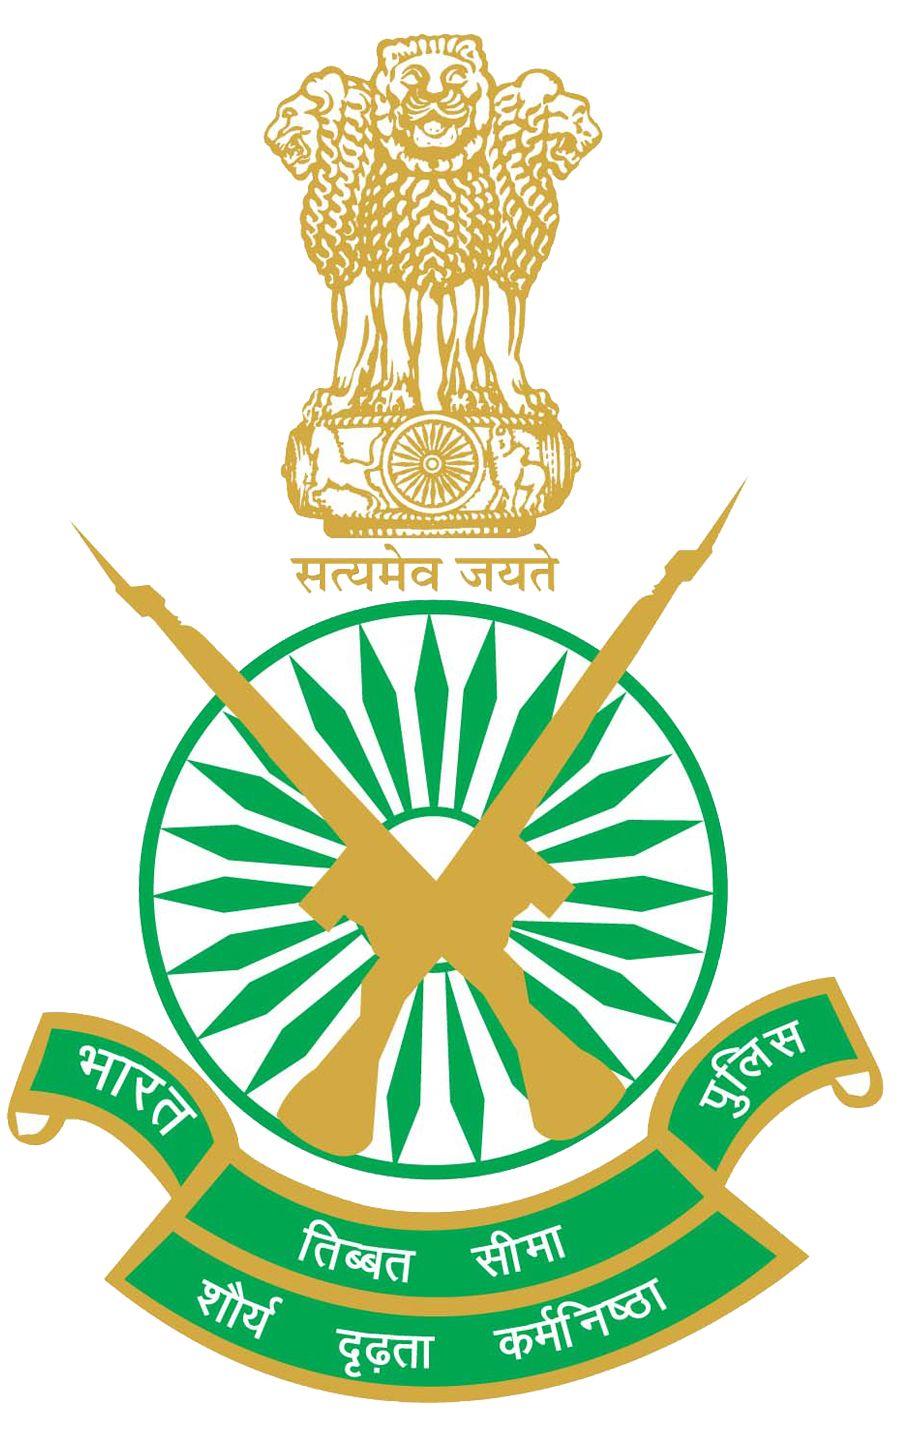 Police Service Logo Indian Police Logo Wallpaper Border Police